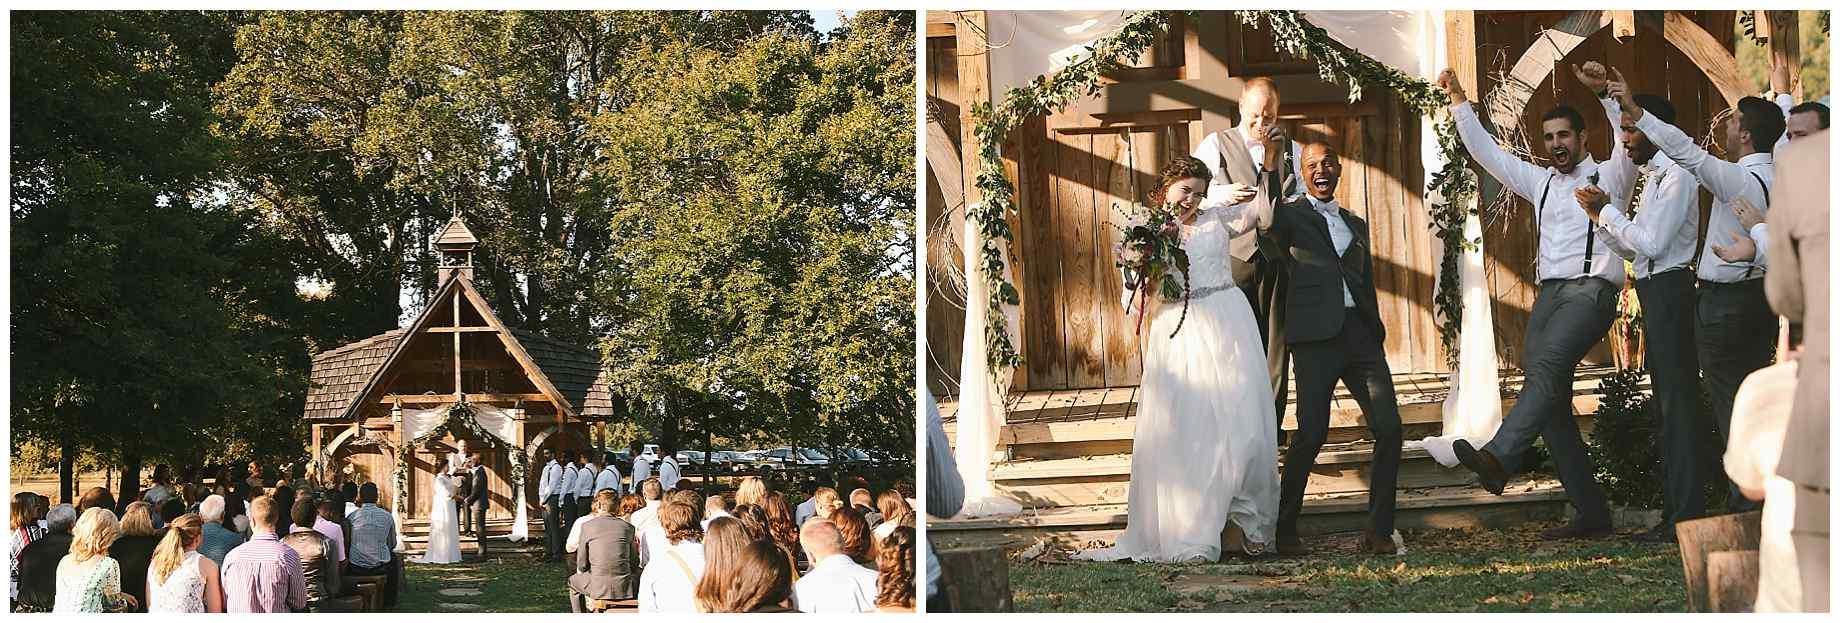 stone-oak-ranch-wedding-003